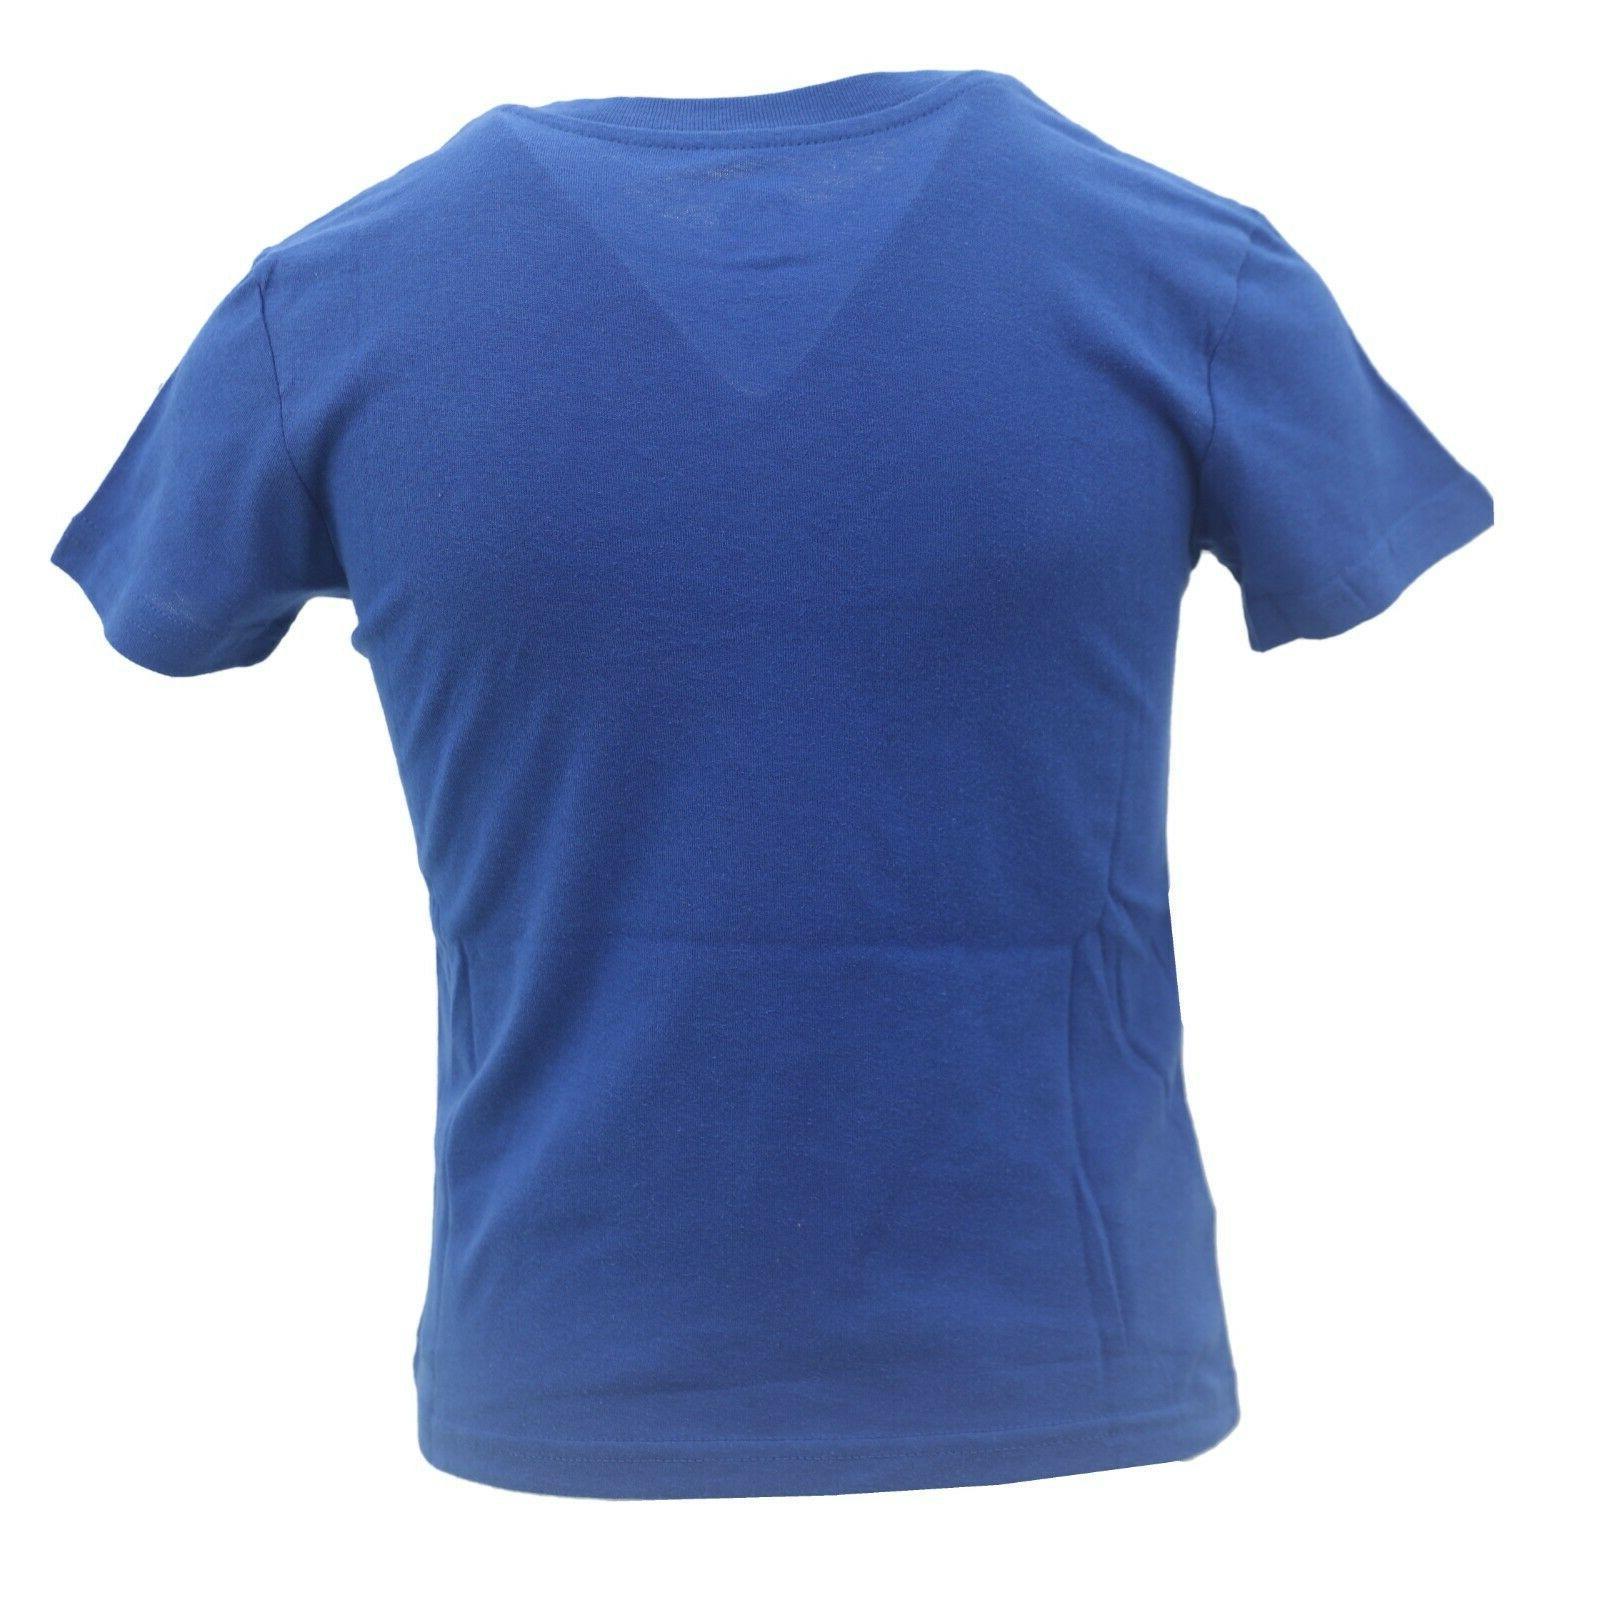 Kansas City Official MLB Kids Size T-Shirt New